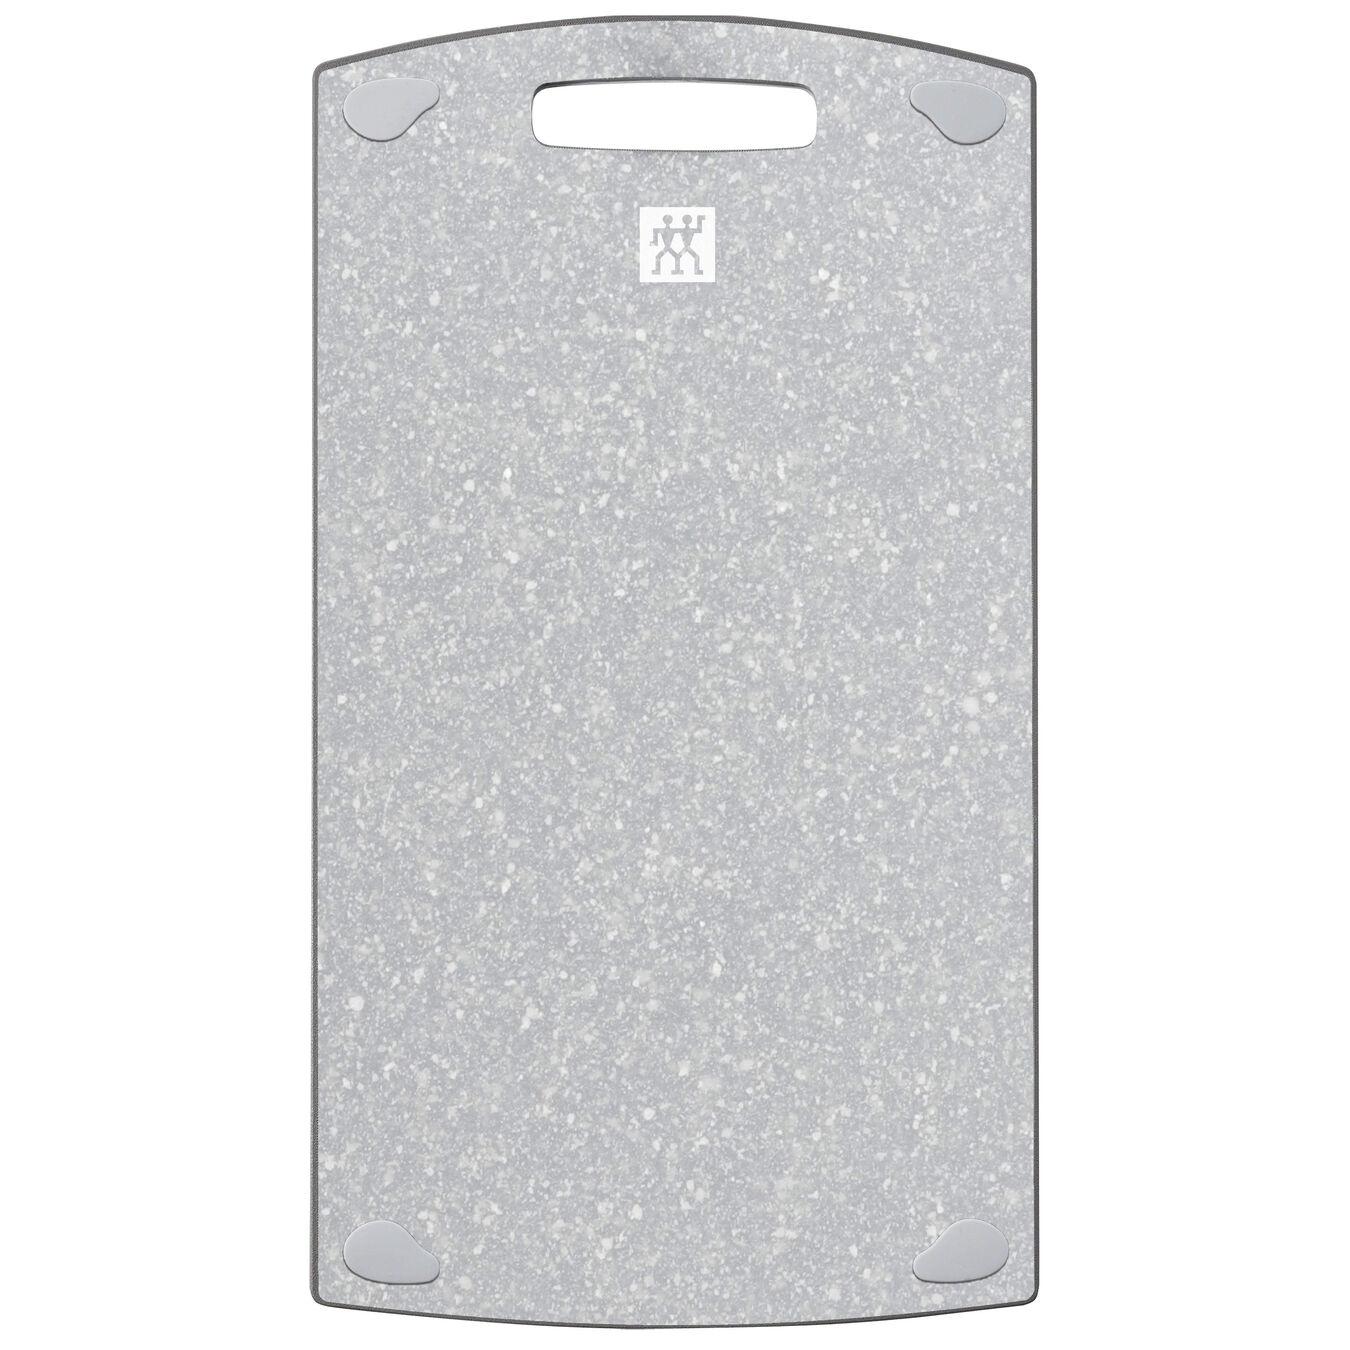 2 pc. Cutting board set, Plastic | 36 cm x 20 cm & 37 cm x 27 cm 36 cm x 20 cm Plastic,,large 7